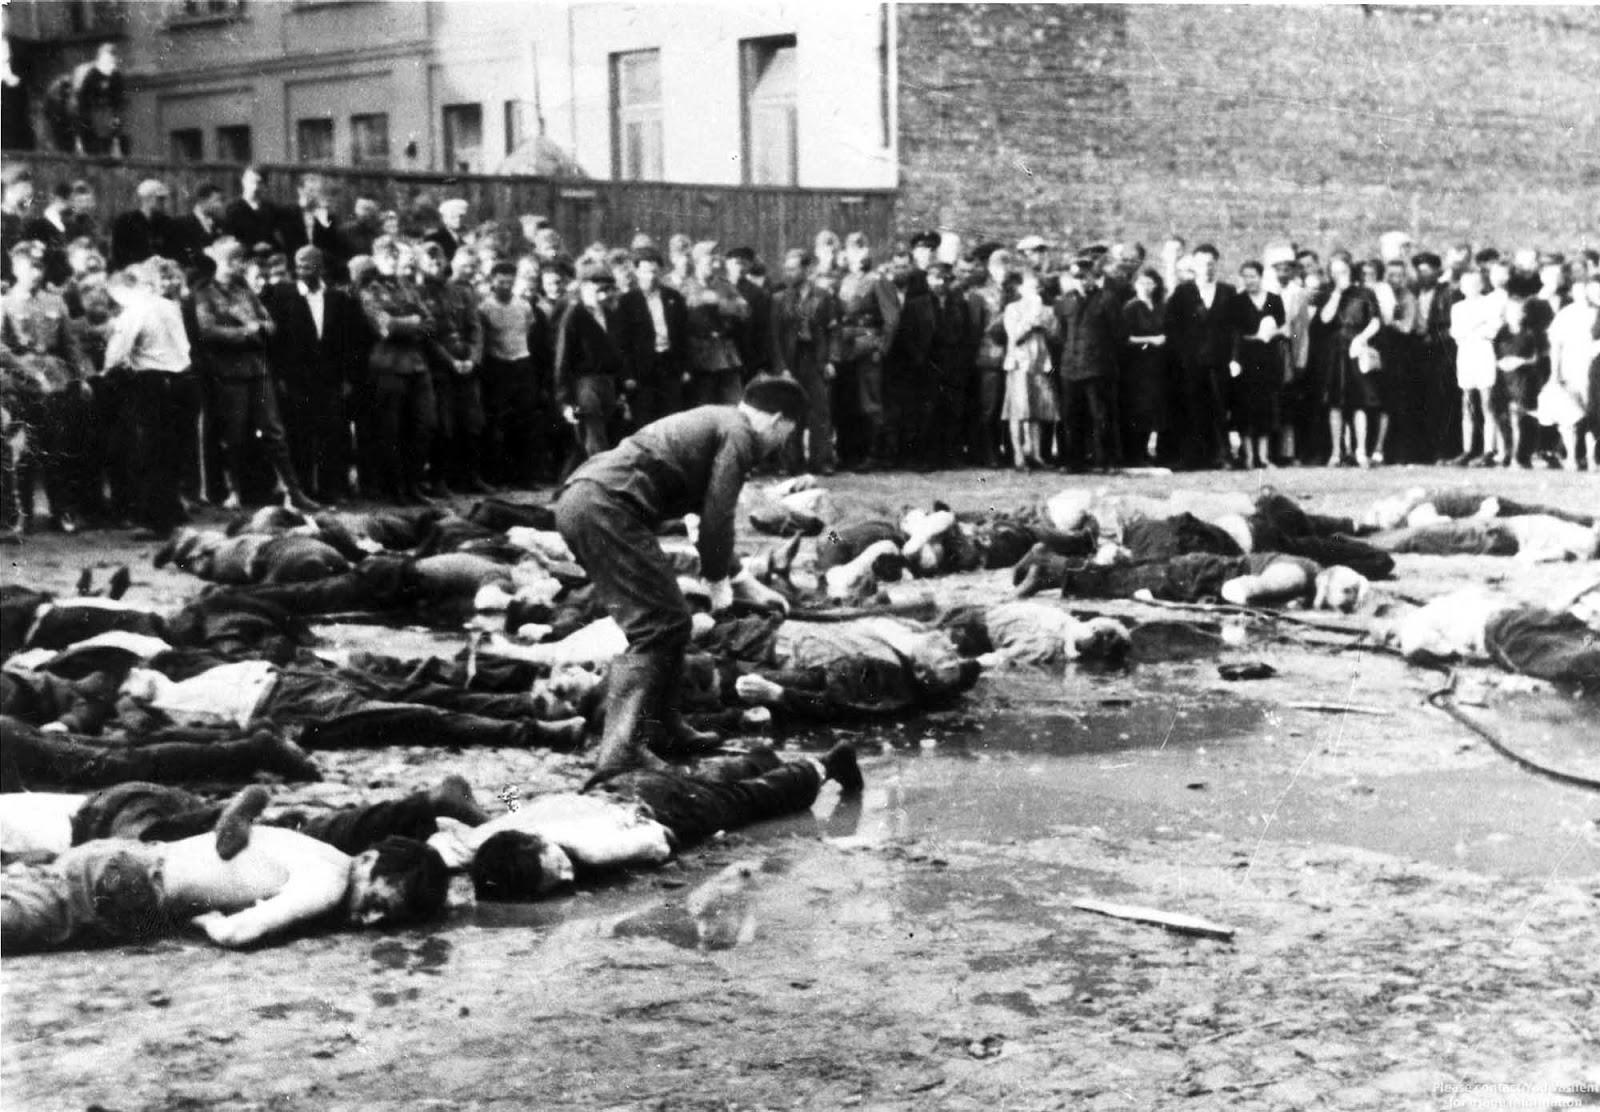 Litvanya Garaj Katliamı'na dair bir foto, 1941